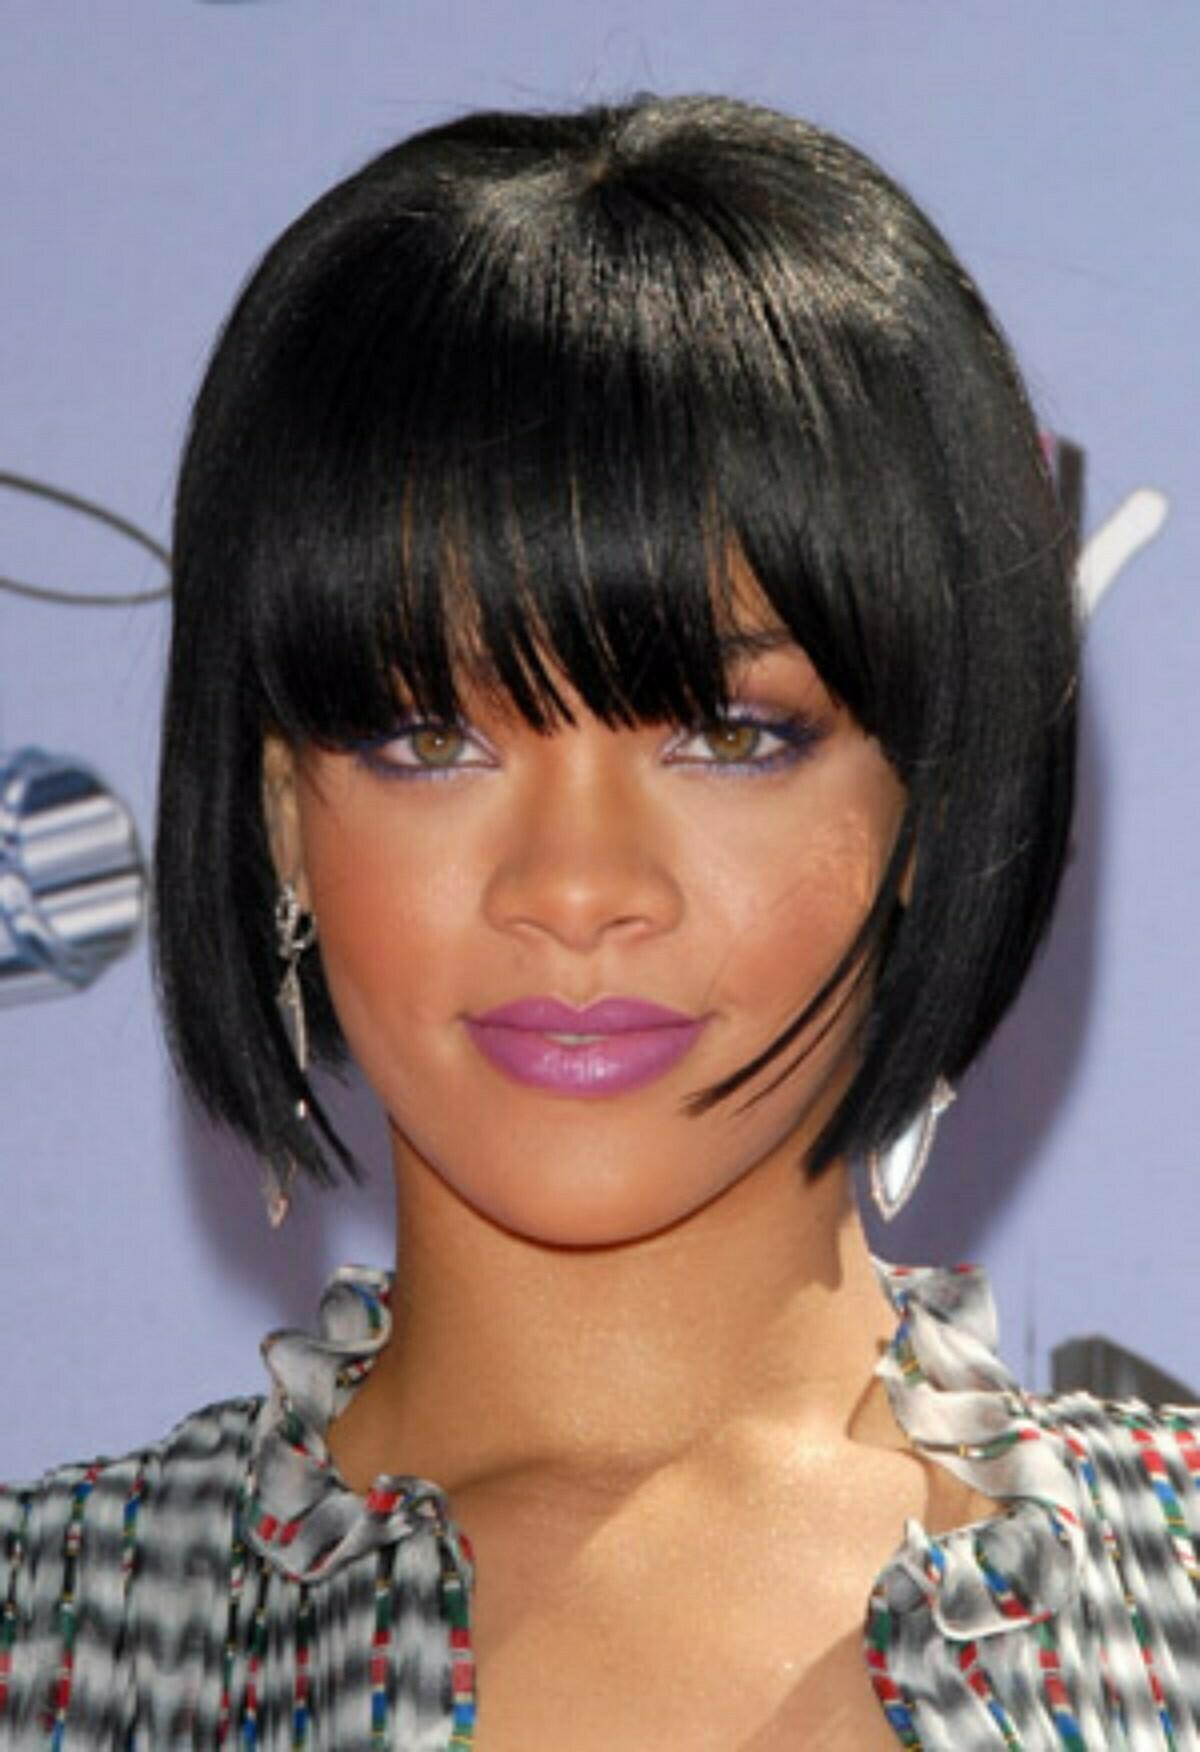 Fashion of Short Haircuts for Black Women